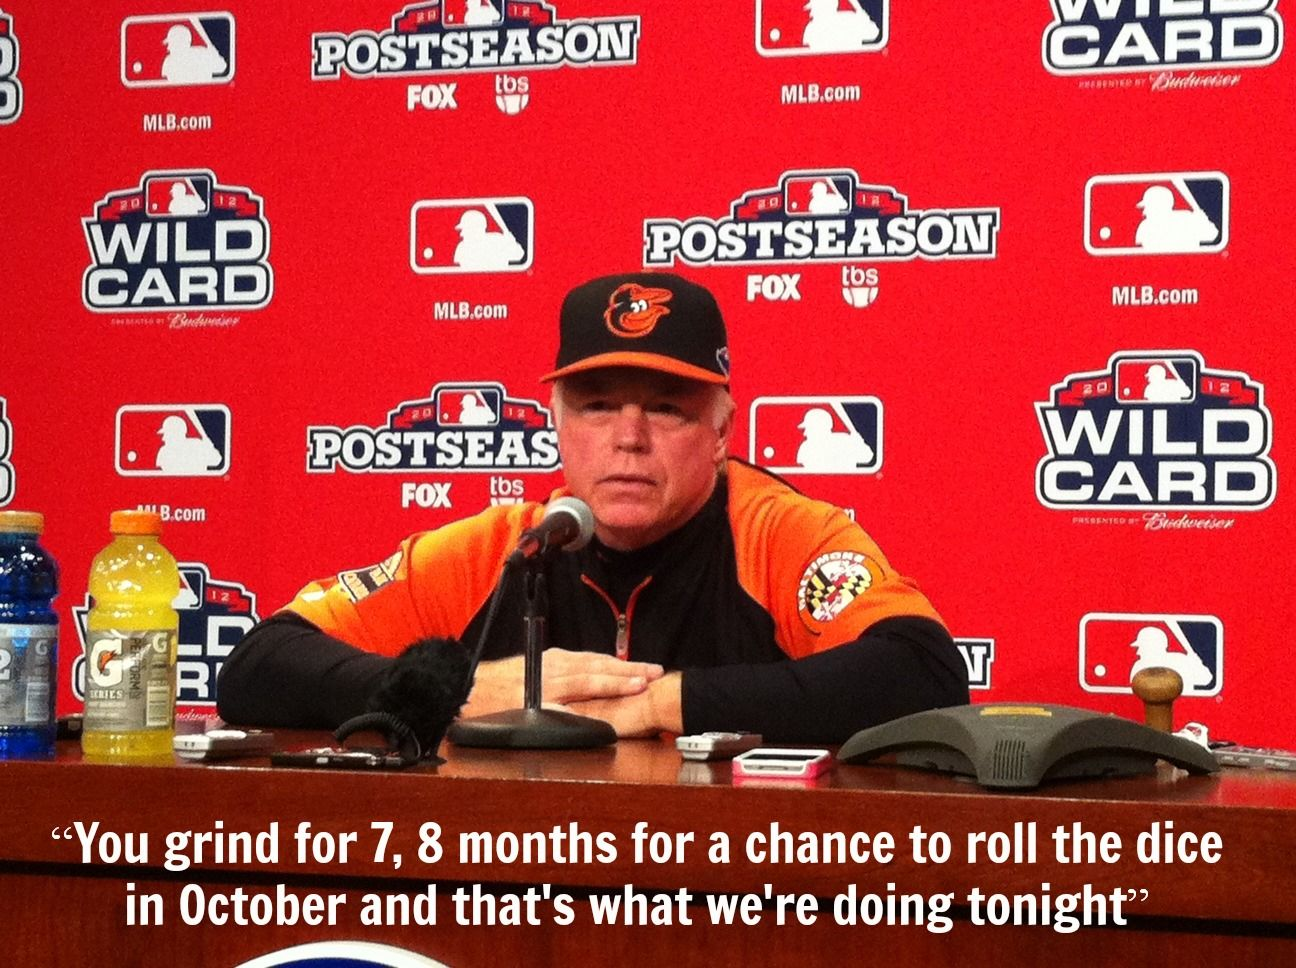 Buckleup Baseball Quotes Play Baseball Fox Mlb